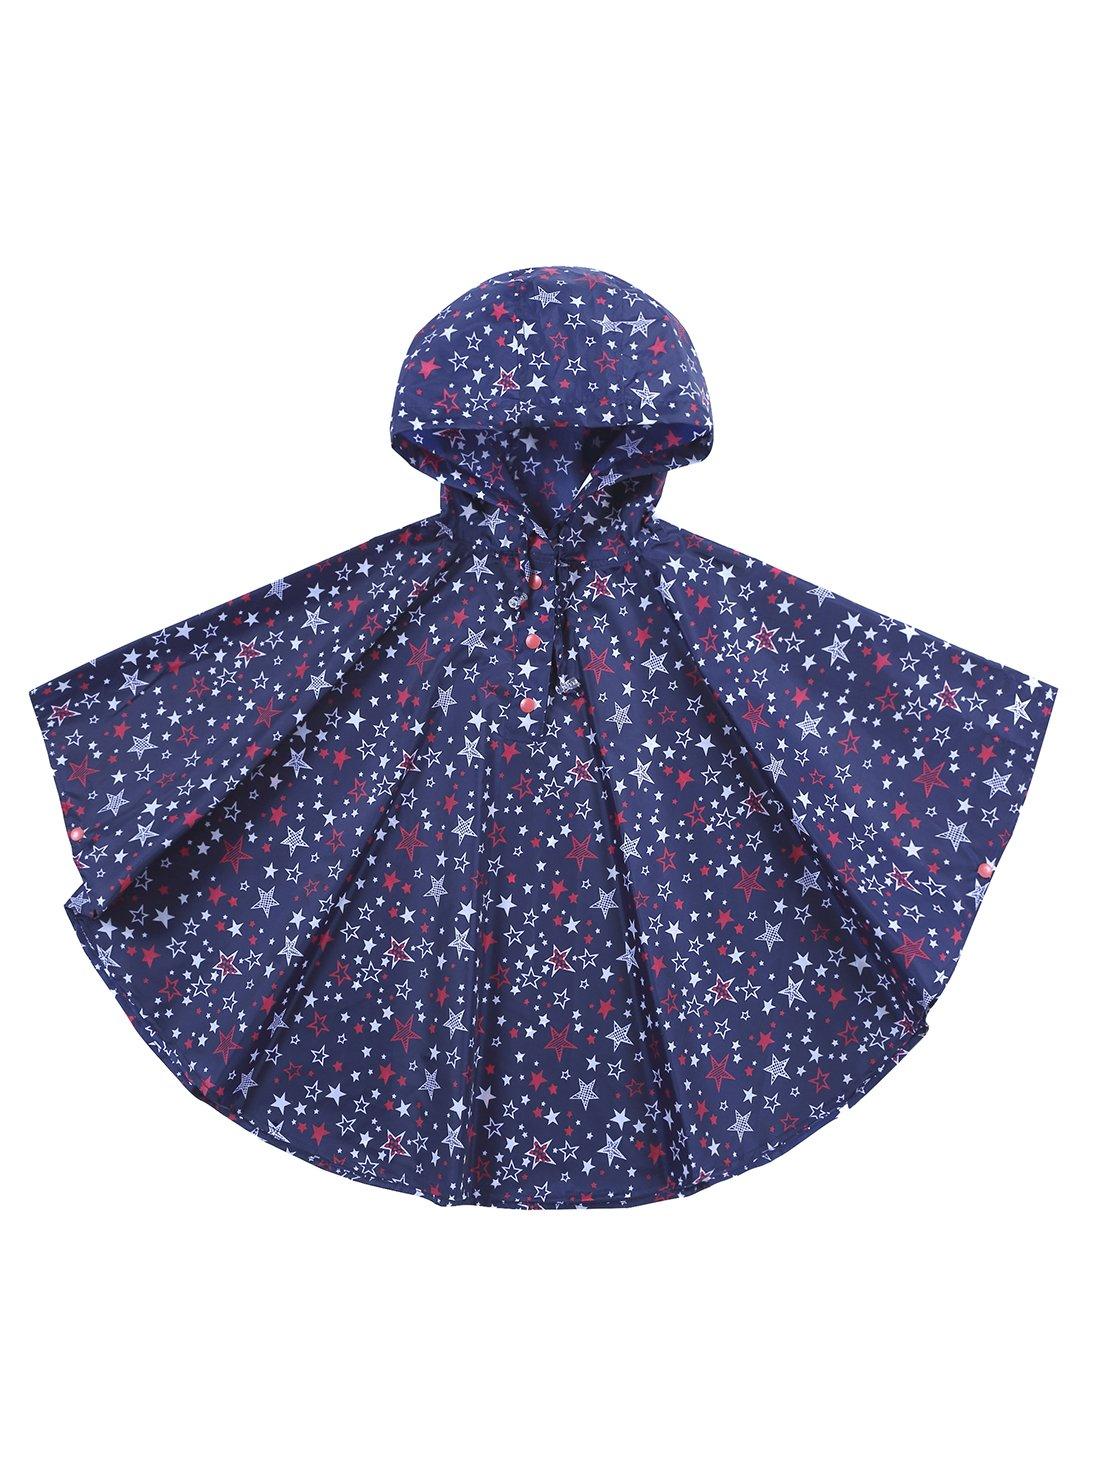 URBEAR Unisex Kids' Raincoat Hooded Waterproof Outdoor Trekking Poncho Suit Raincoat in a Bag, Blue M(100-130CM) Blue M(100-130CM) B80603XX-BM